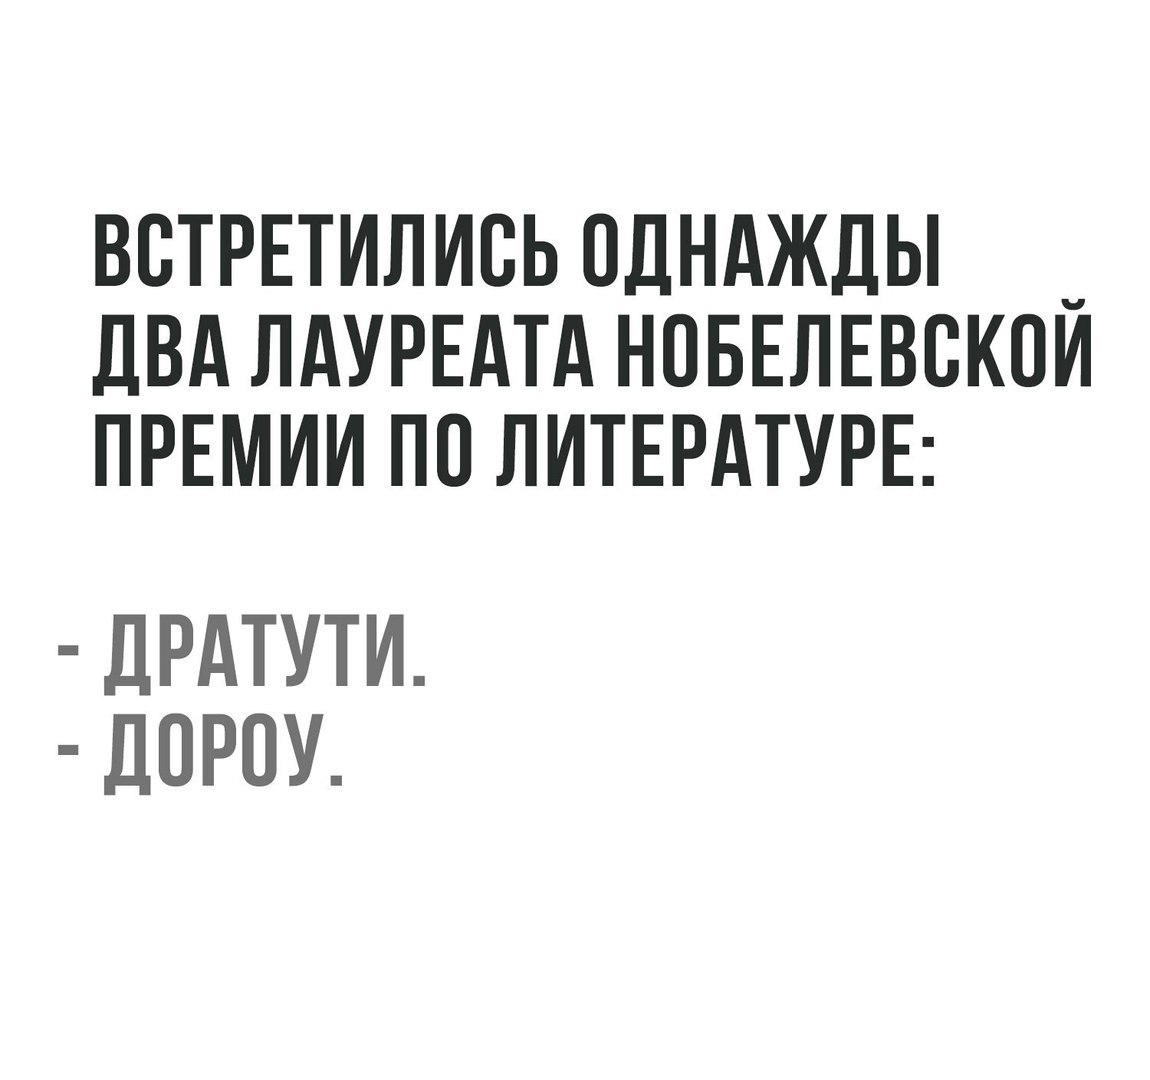 https://pp.userapi.com/c638729/v638729604/4679a/5VkwWGY__3Y.jpg